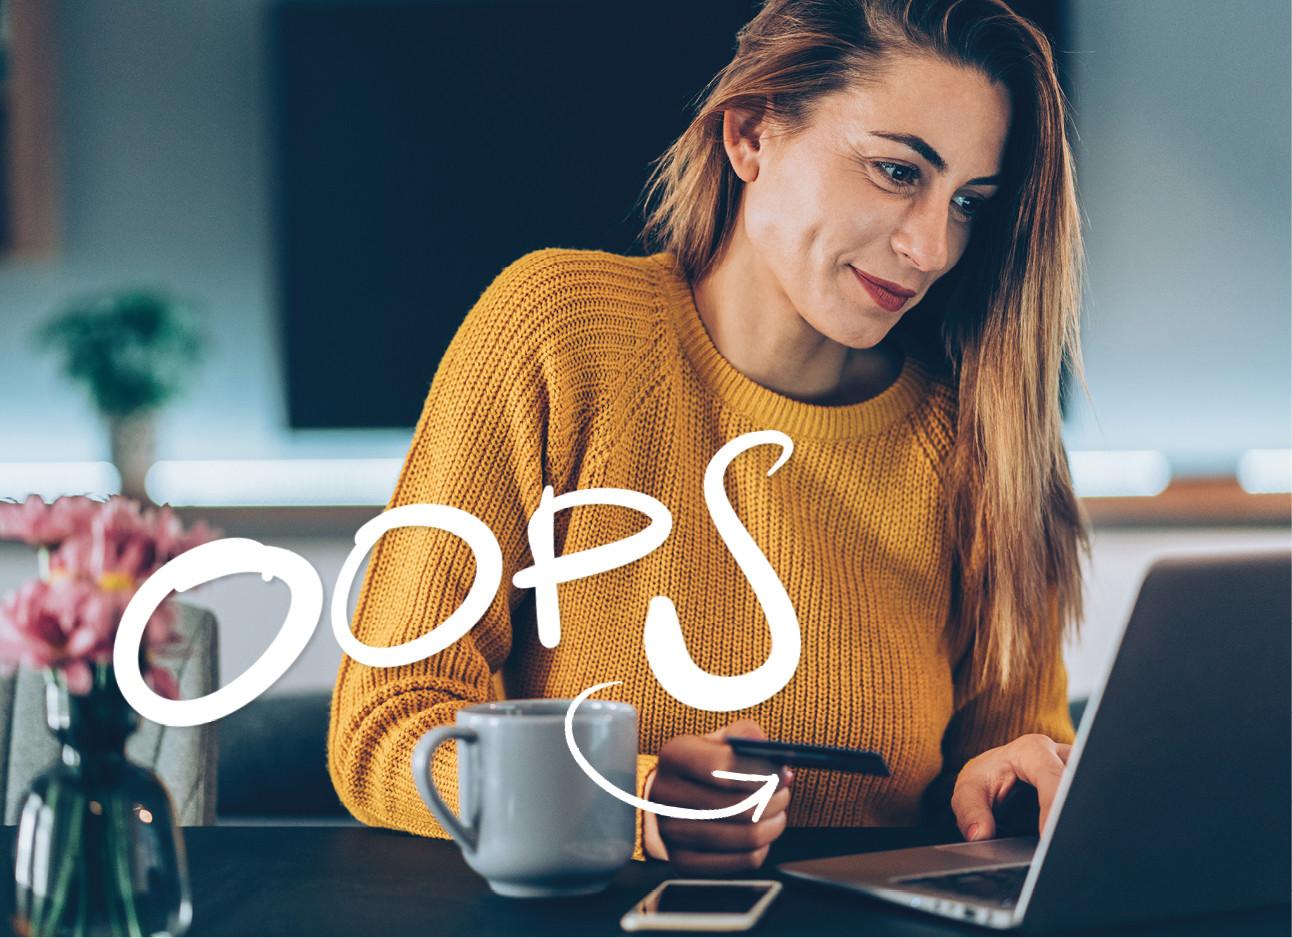 vrouw achter laptop winkelen online lachend in gele trui